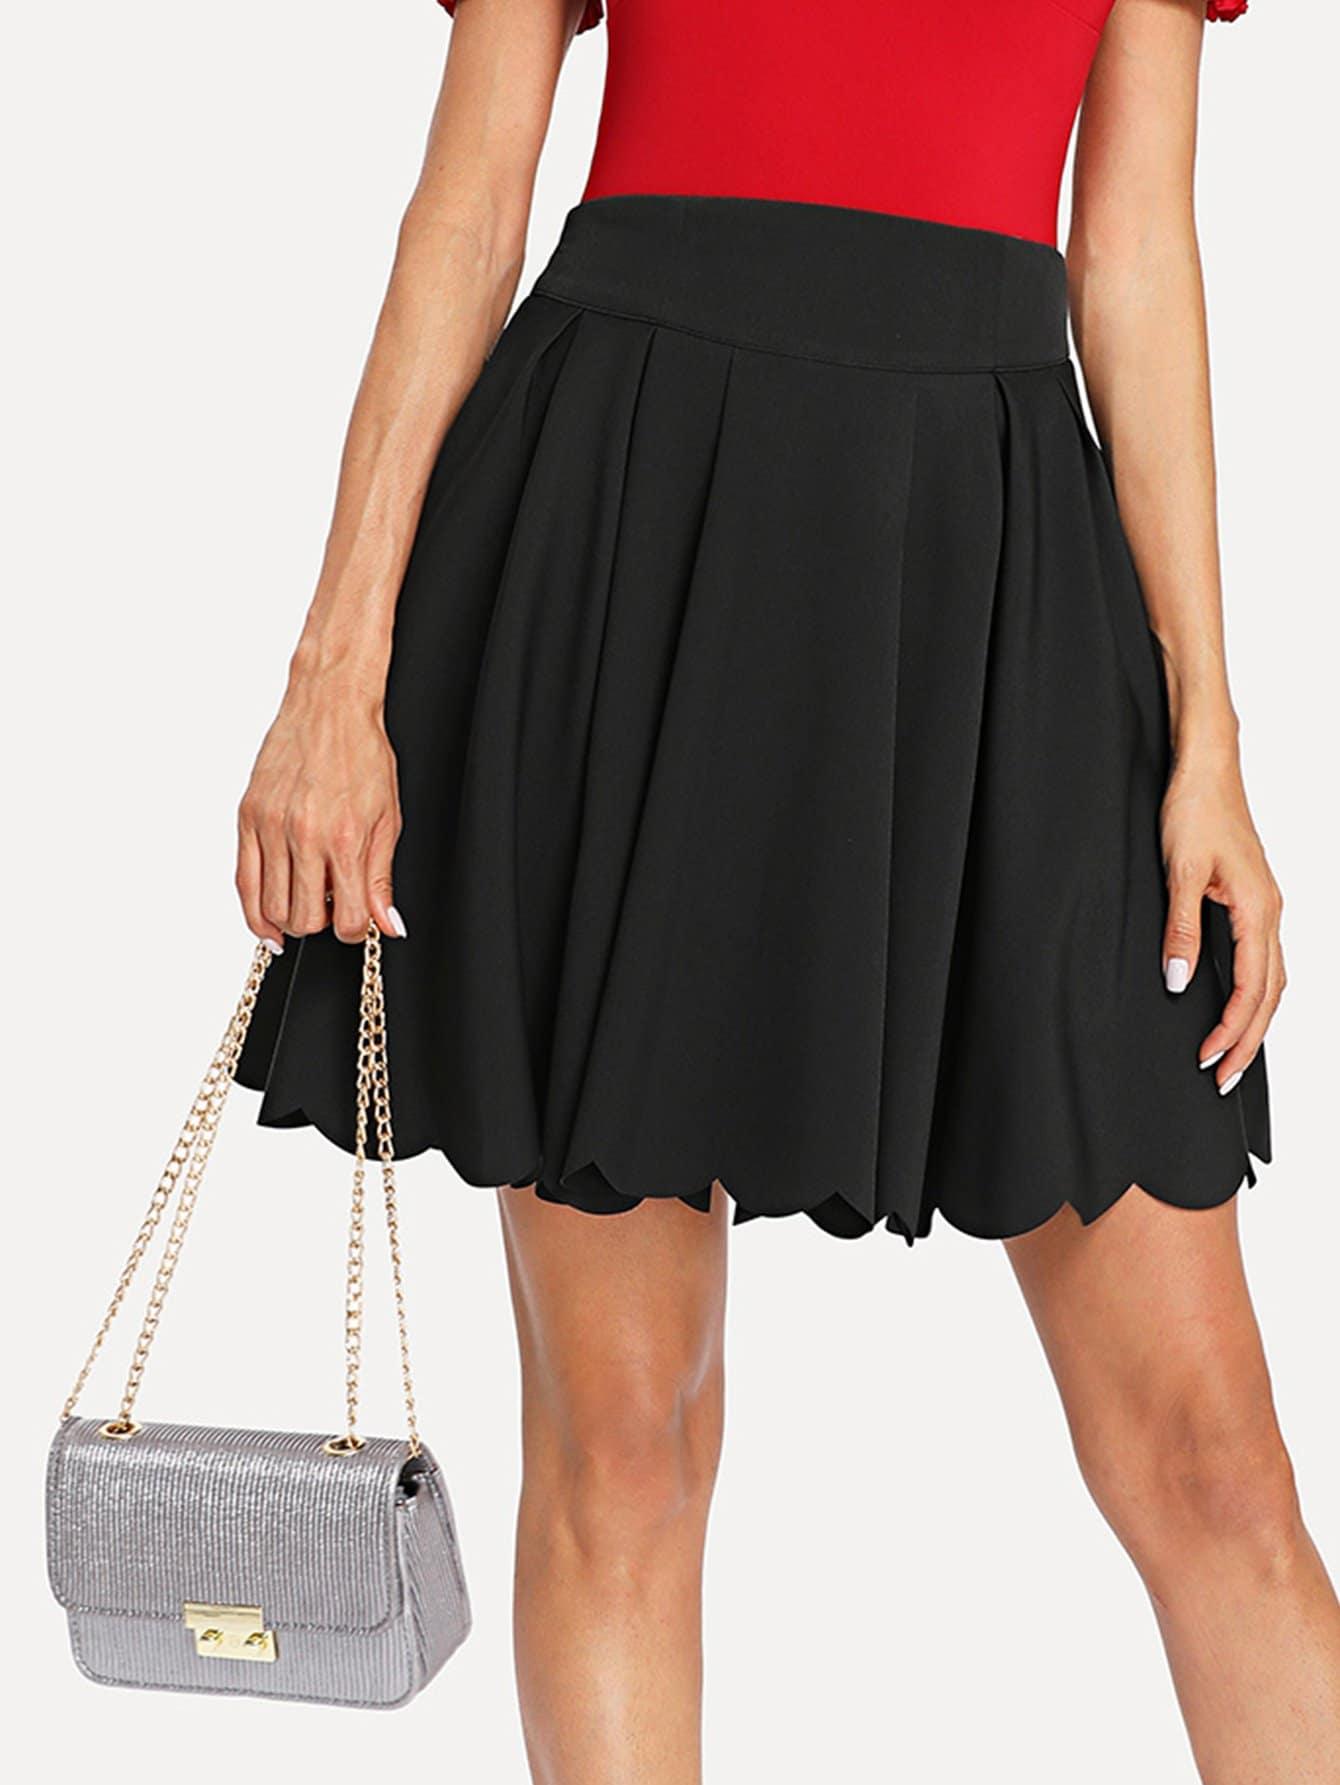 Scallop Edge Box Pleated Skirt box pleated grid skirt